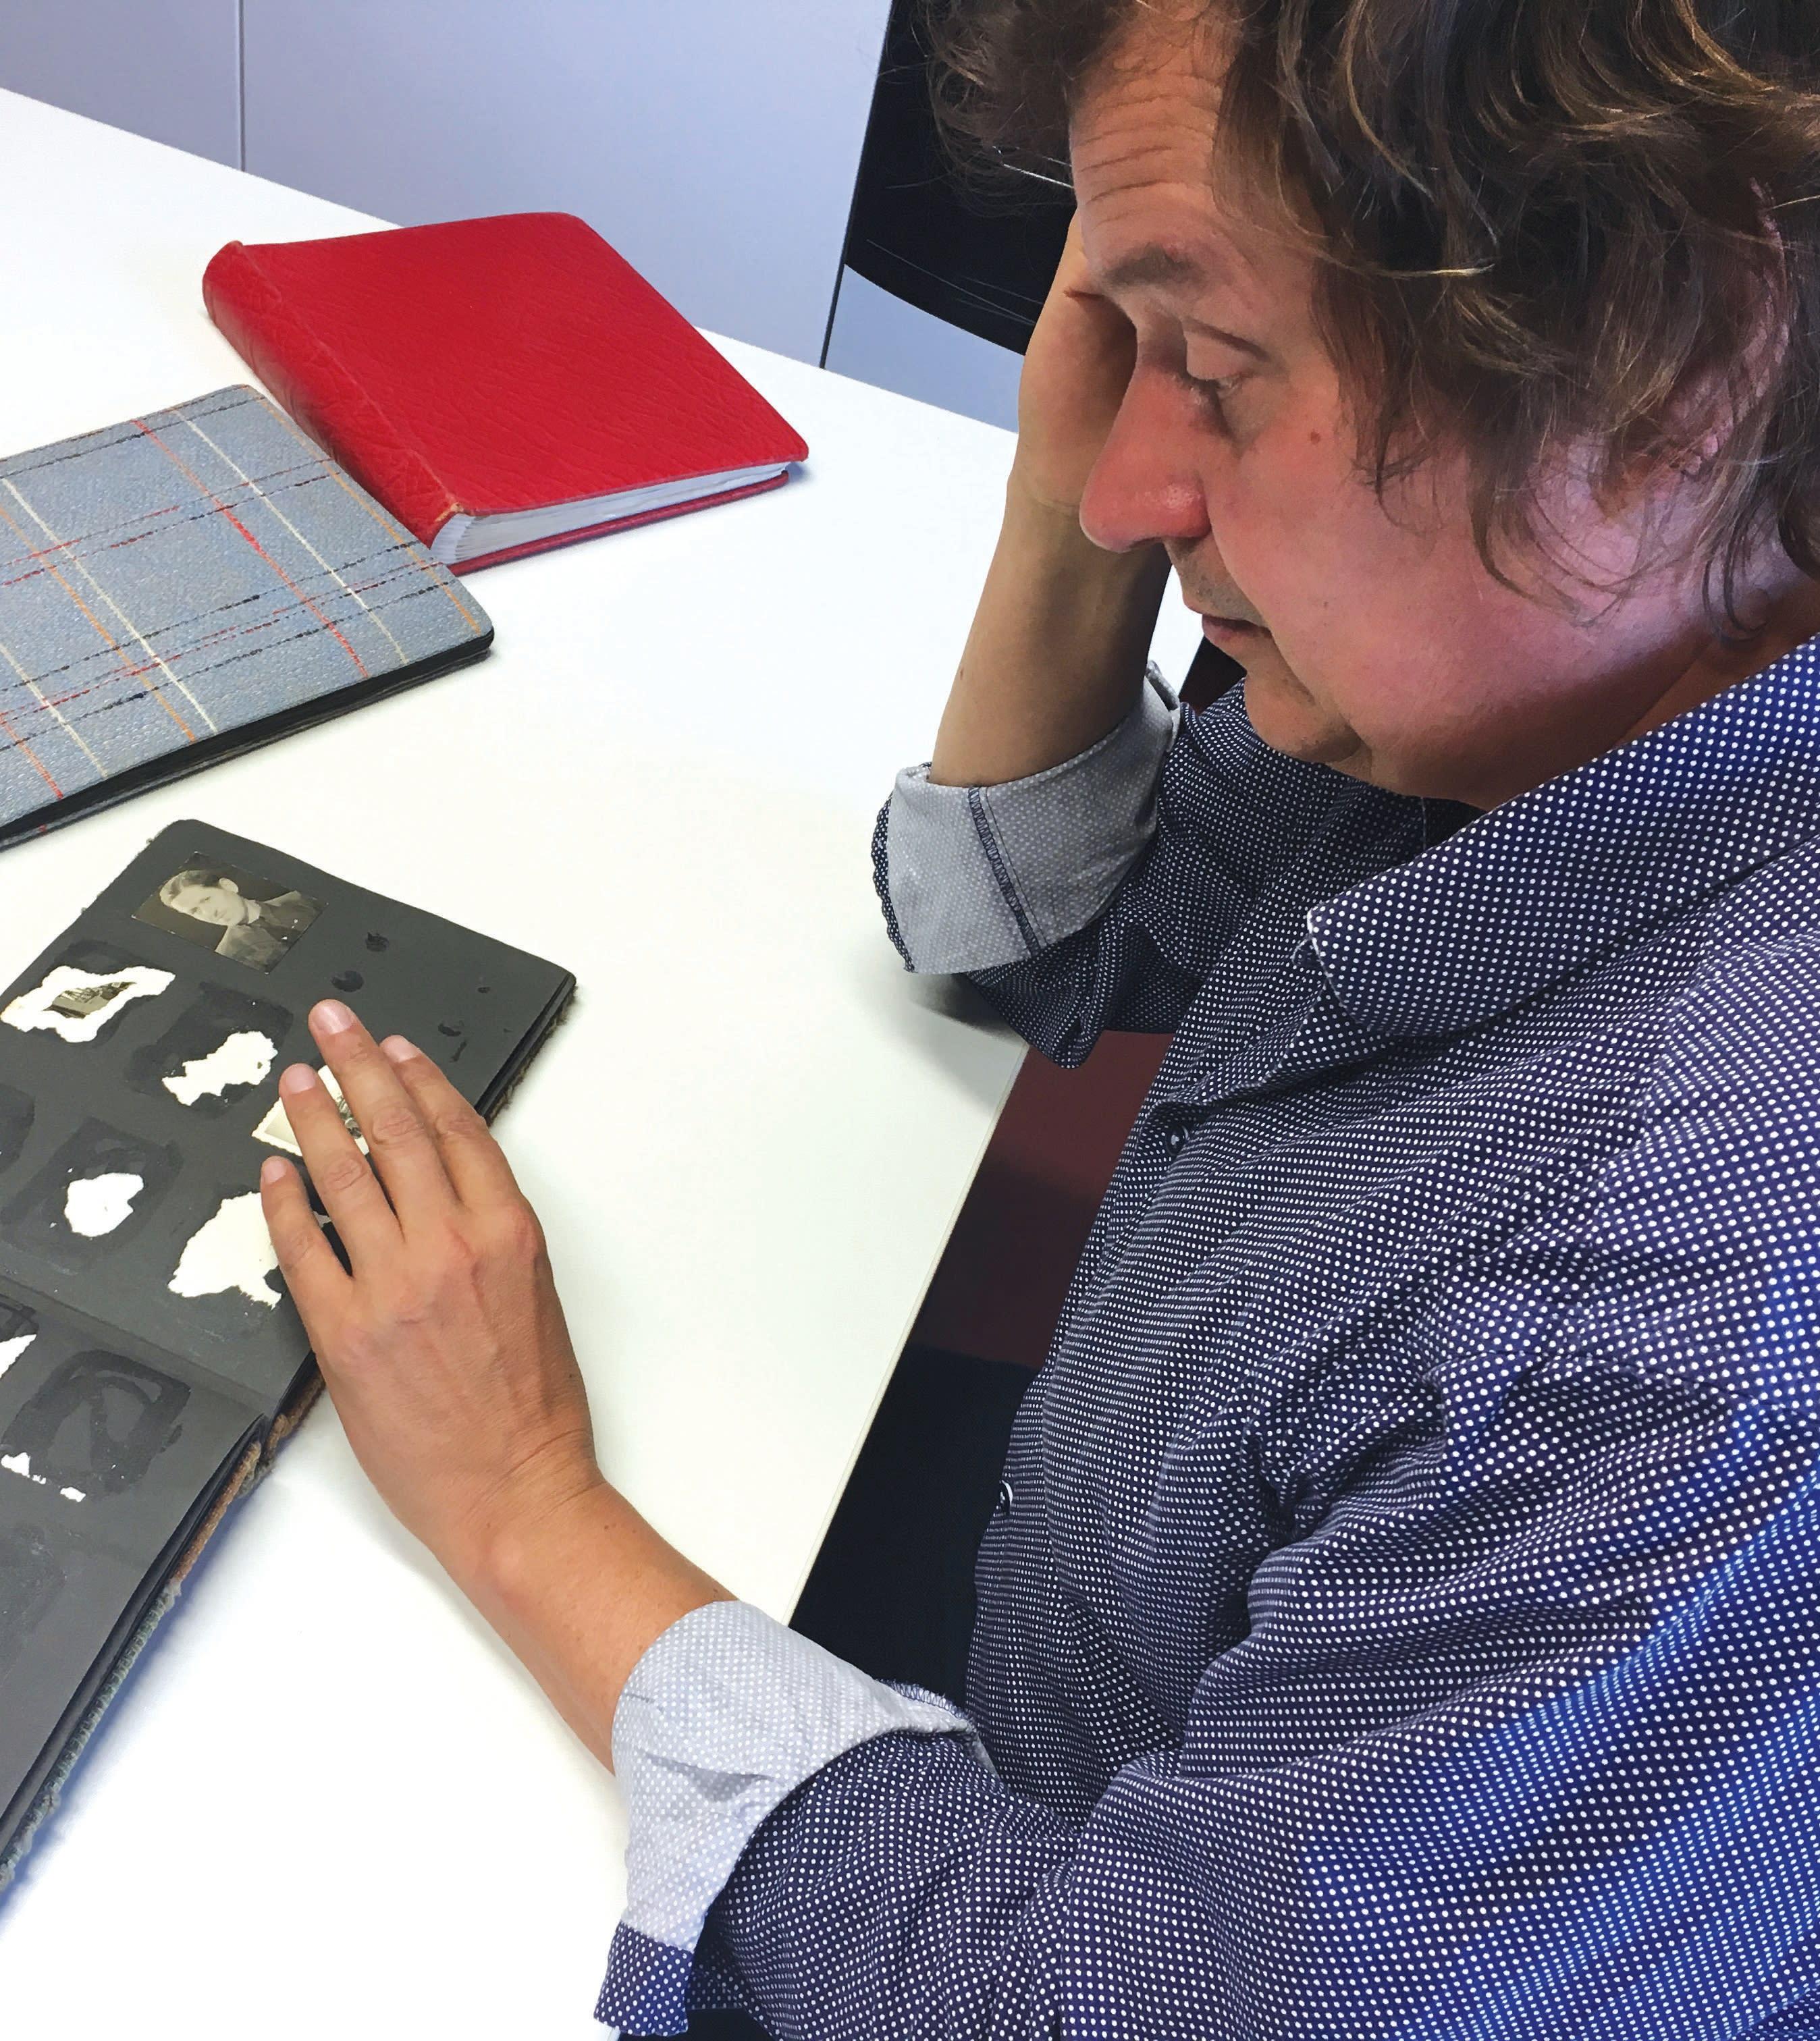 Christoph Kreutzmueller views old albums (Orit Arfa)